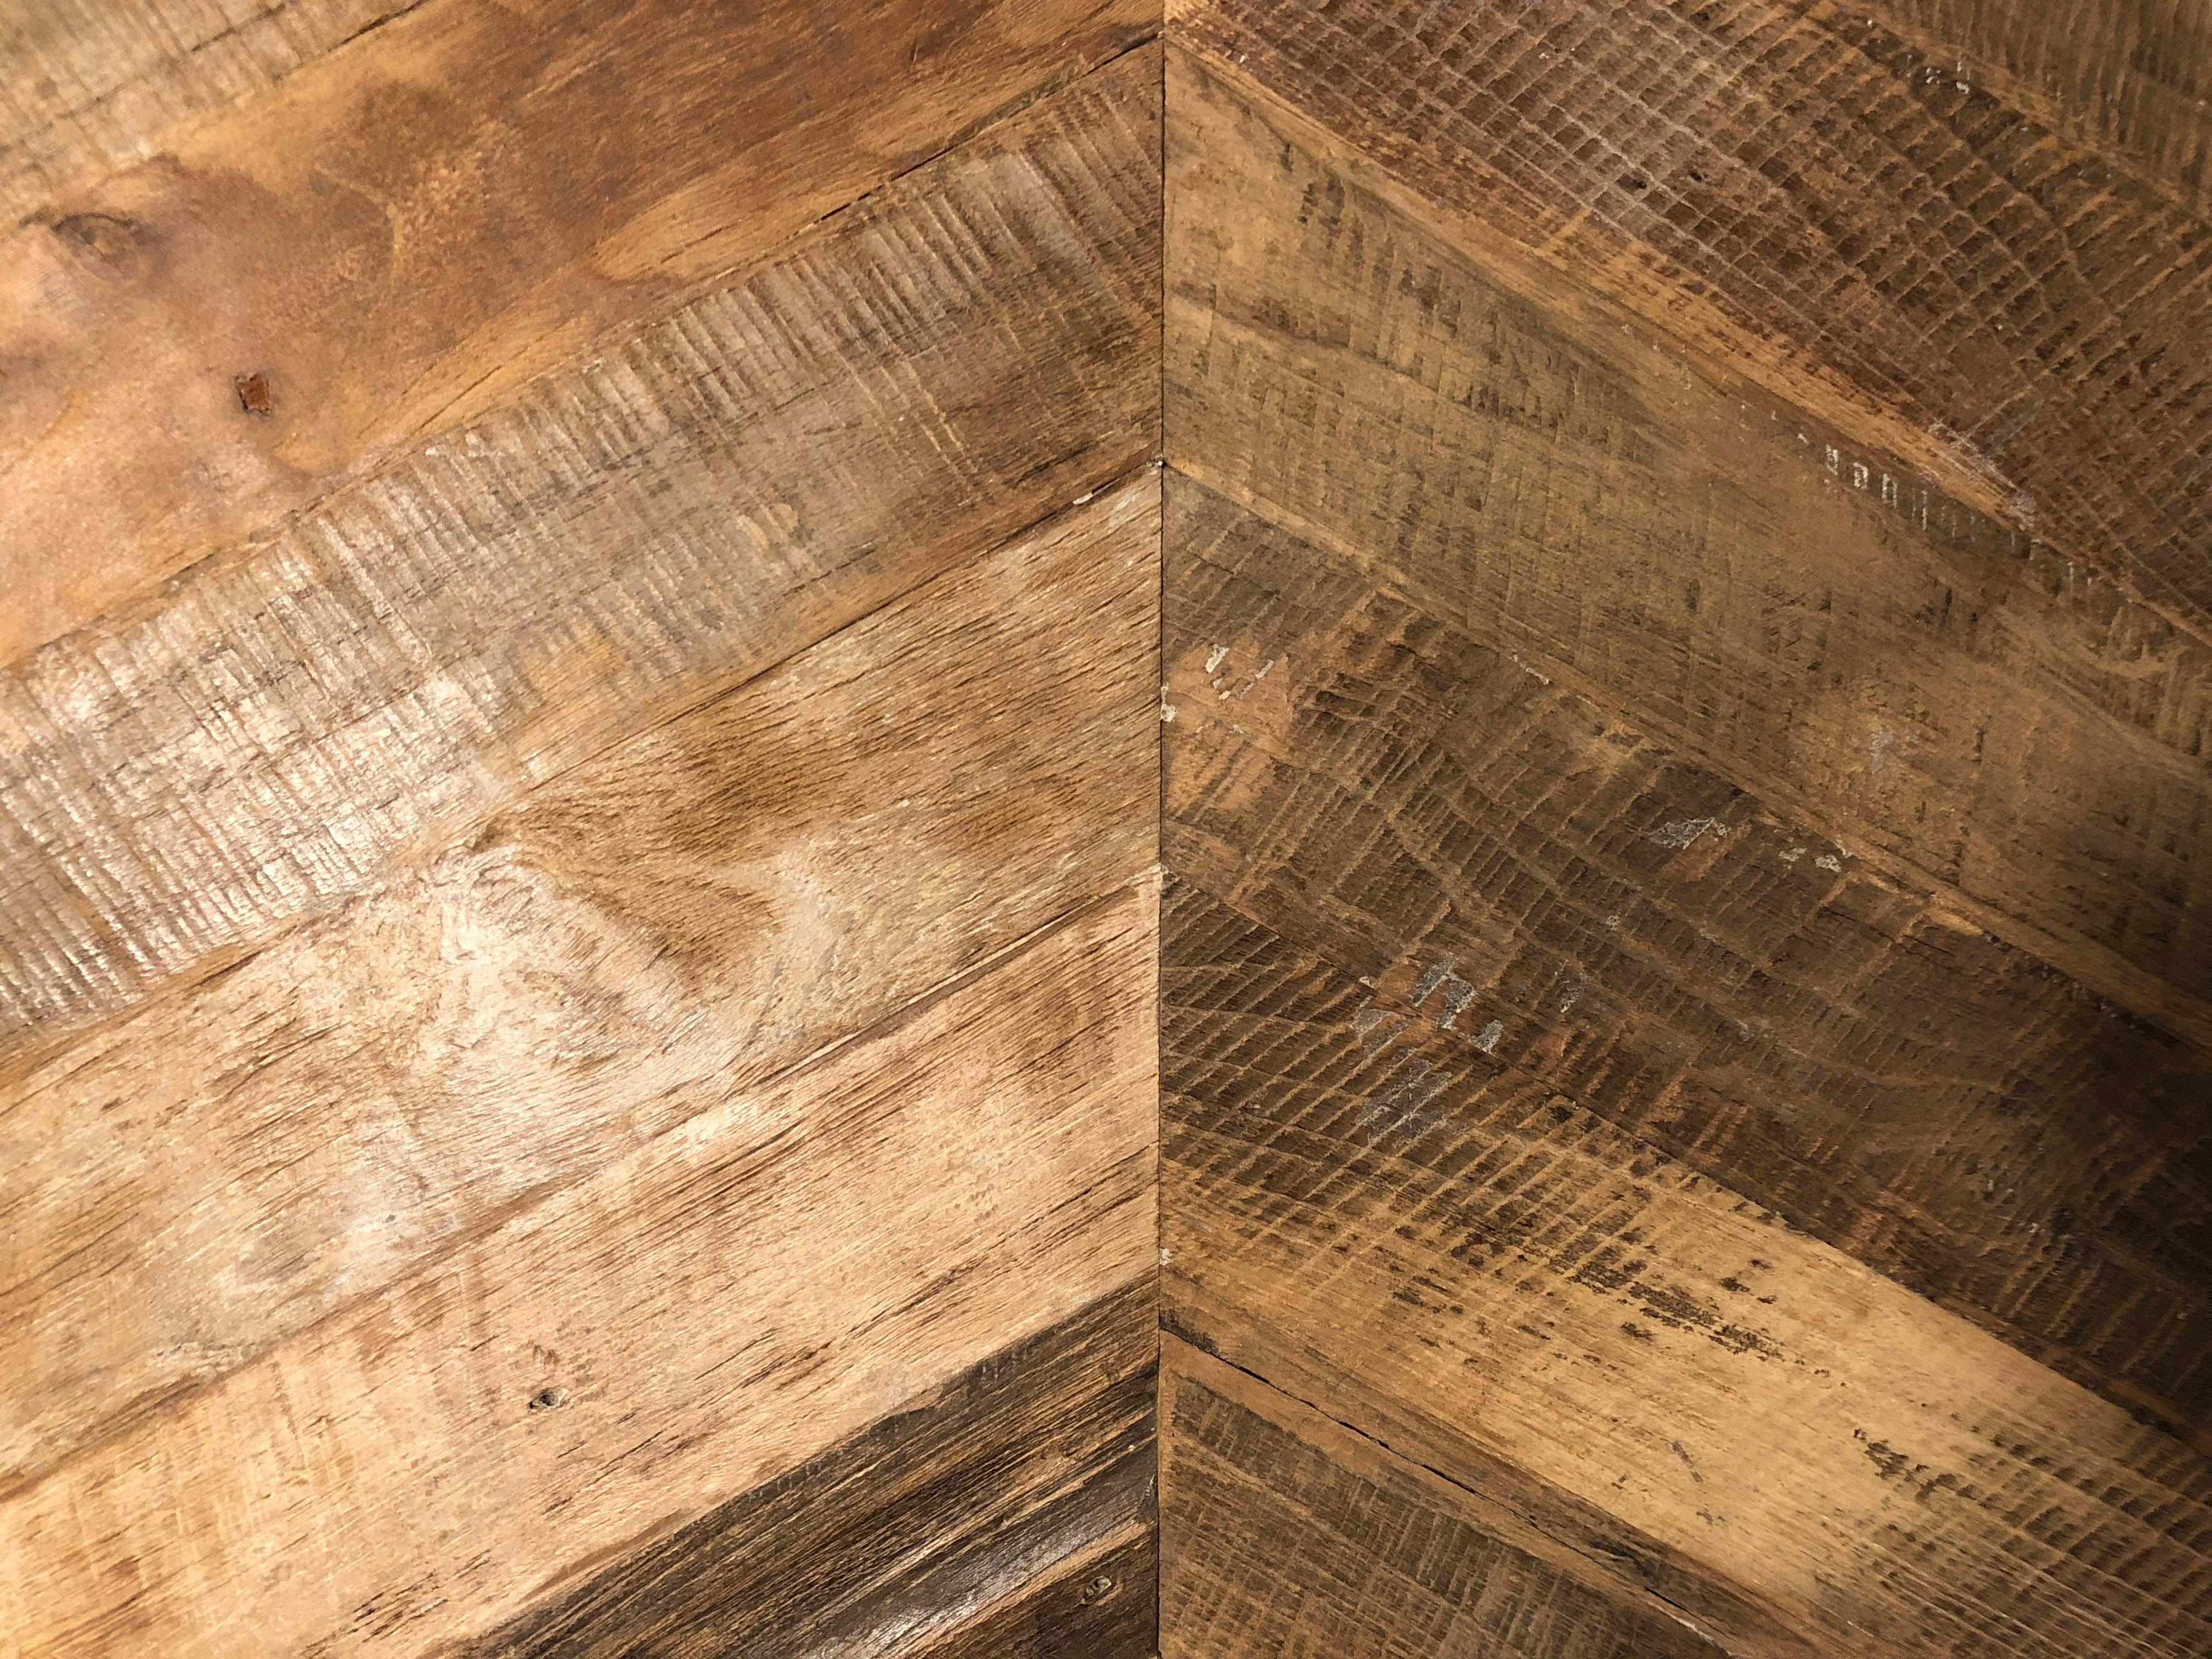 chevron patina plywood - Reclaimed Teak Plywood Panels